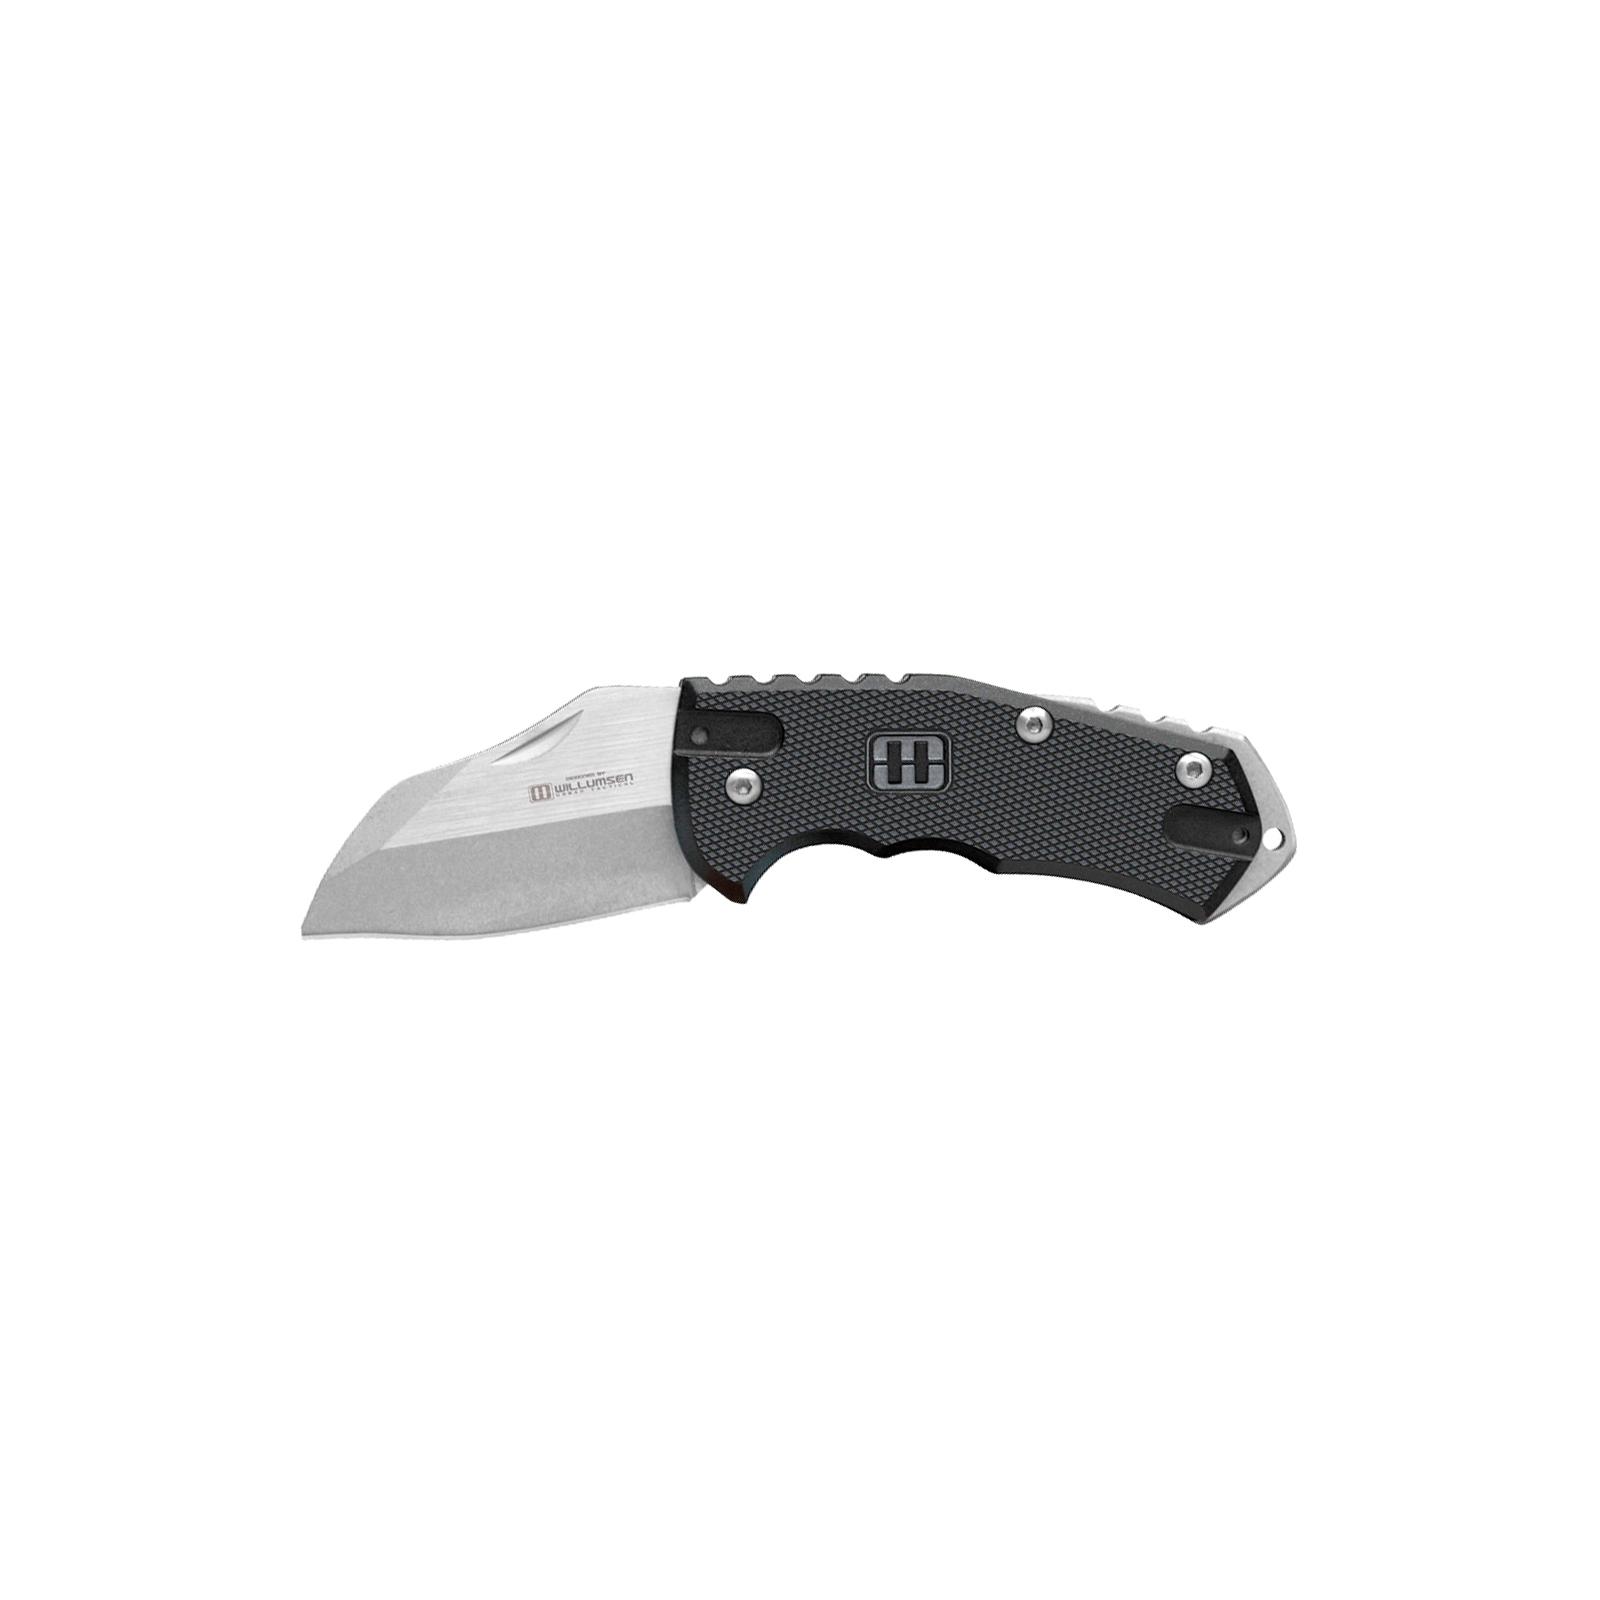 Нож Lansky World Legal (BXKN333)